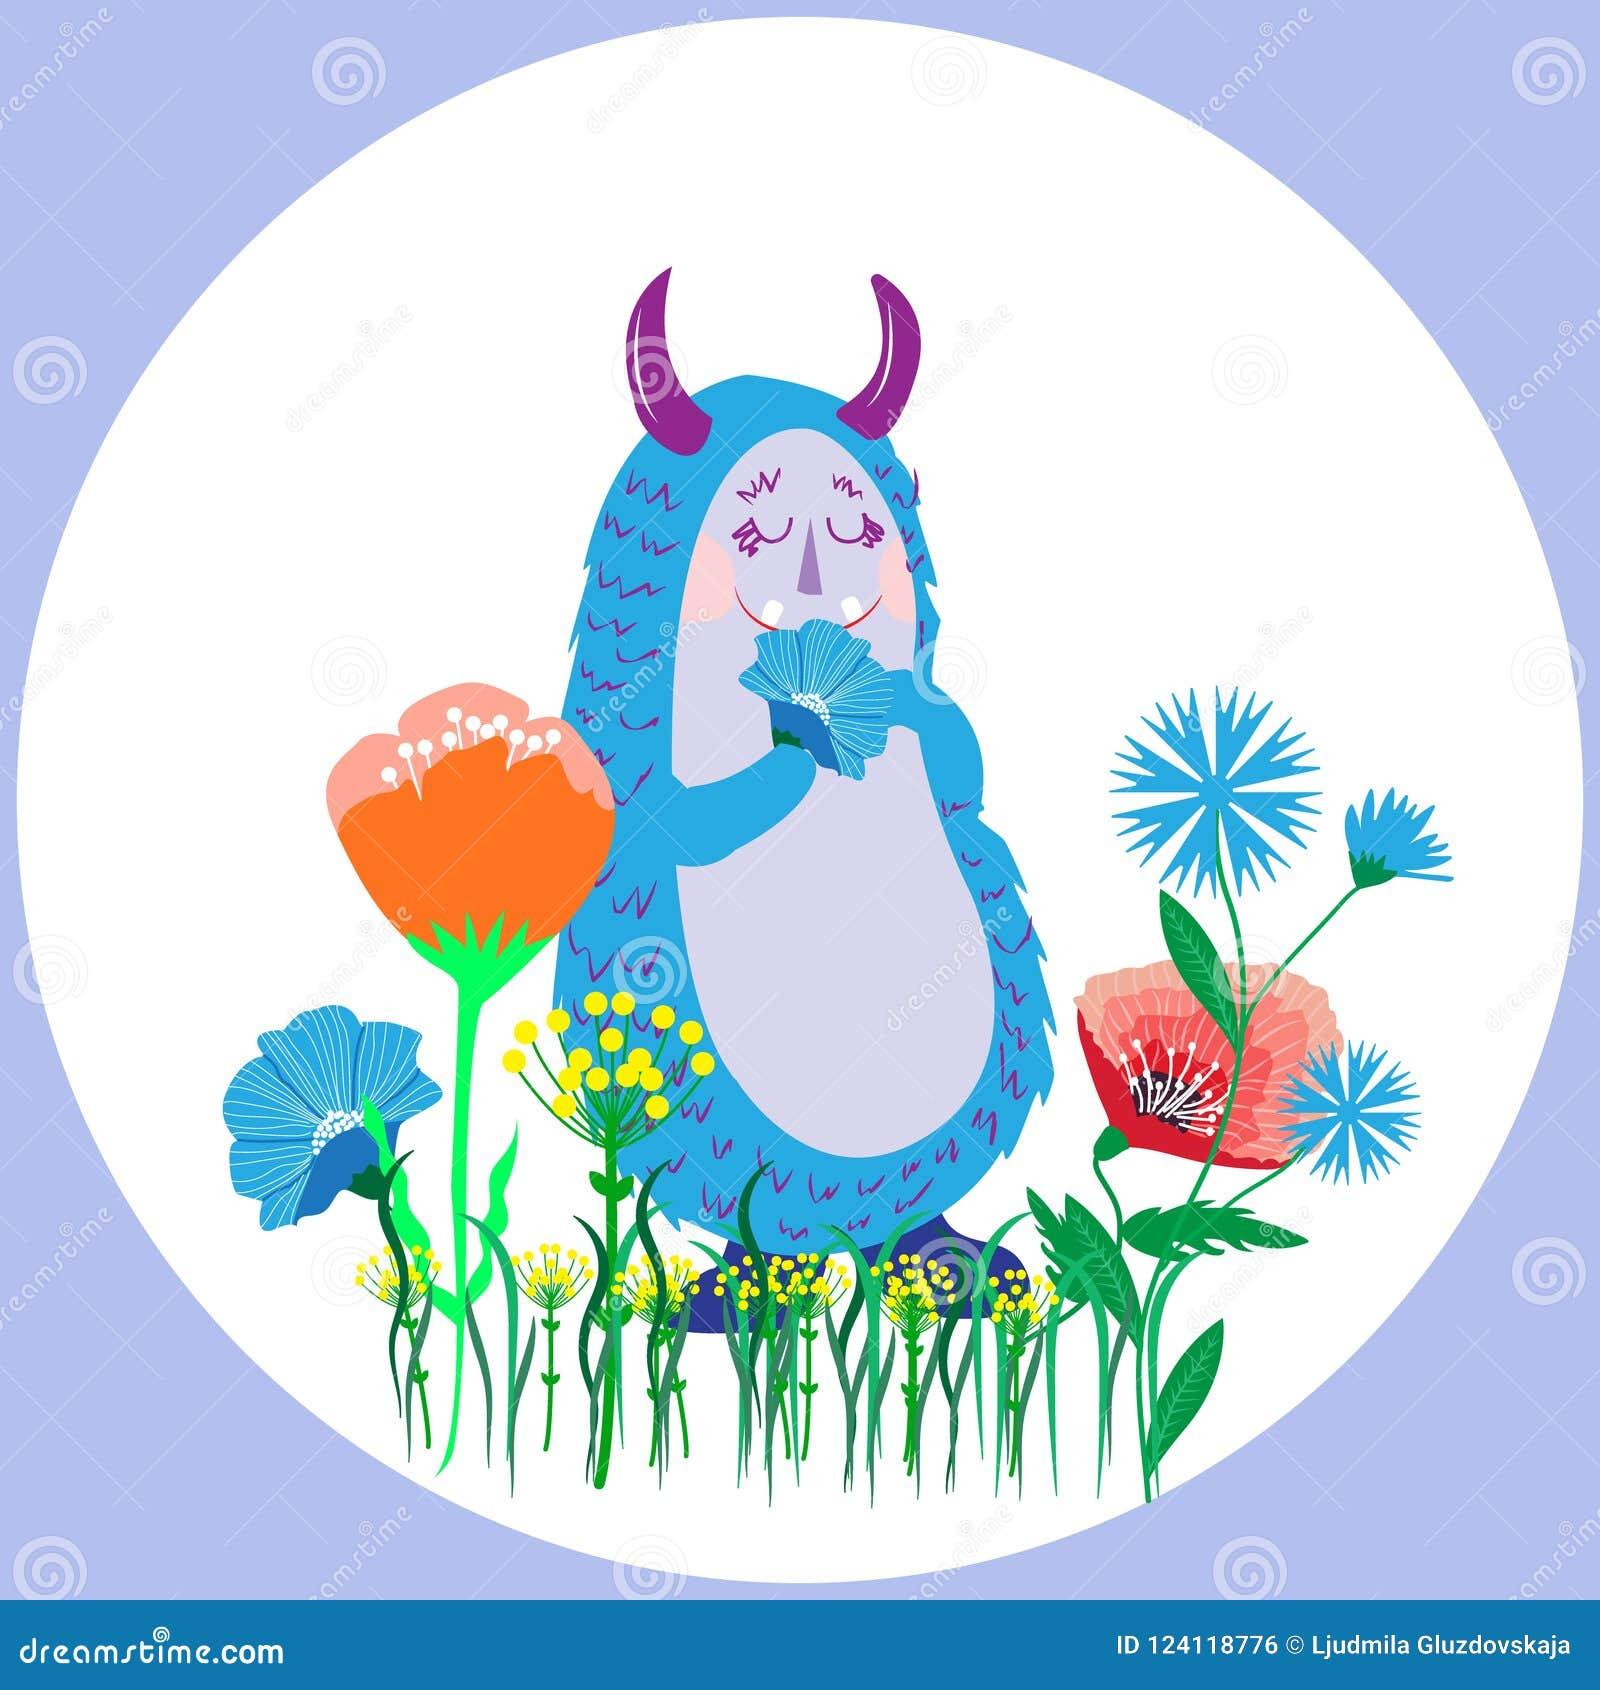 Monstruo divertido peludo lanudo lindo con la flor en la pata, carto del garabato